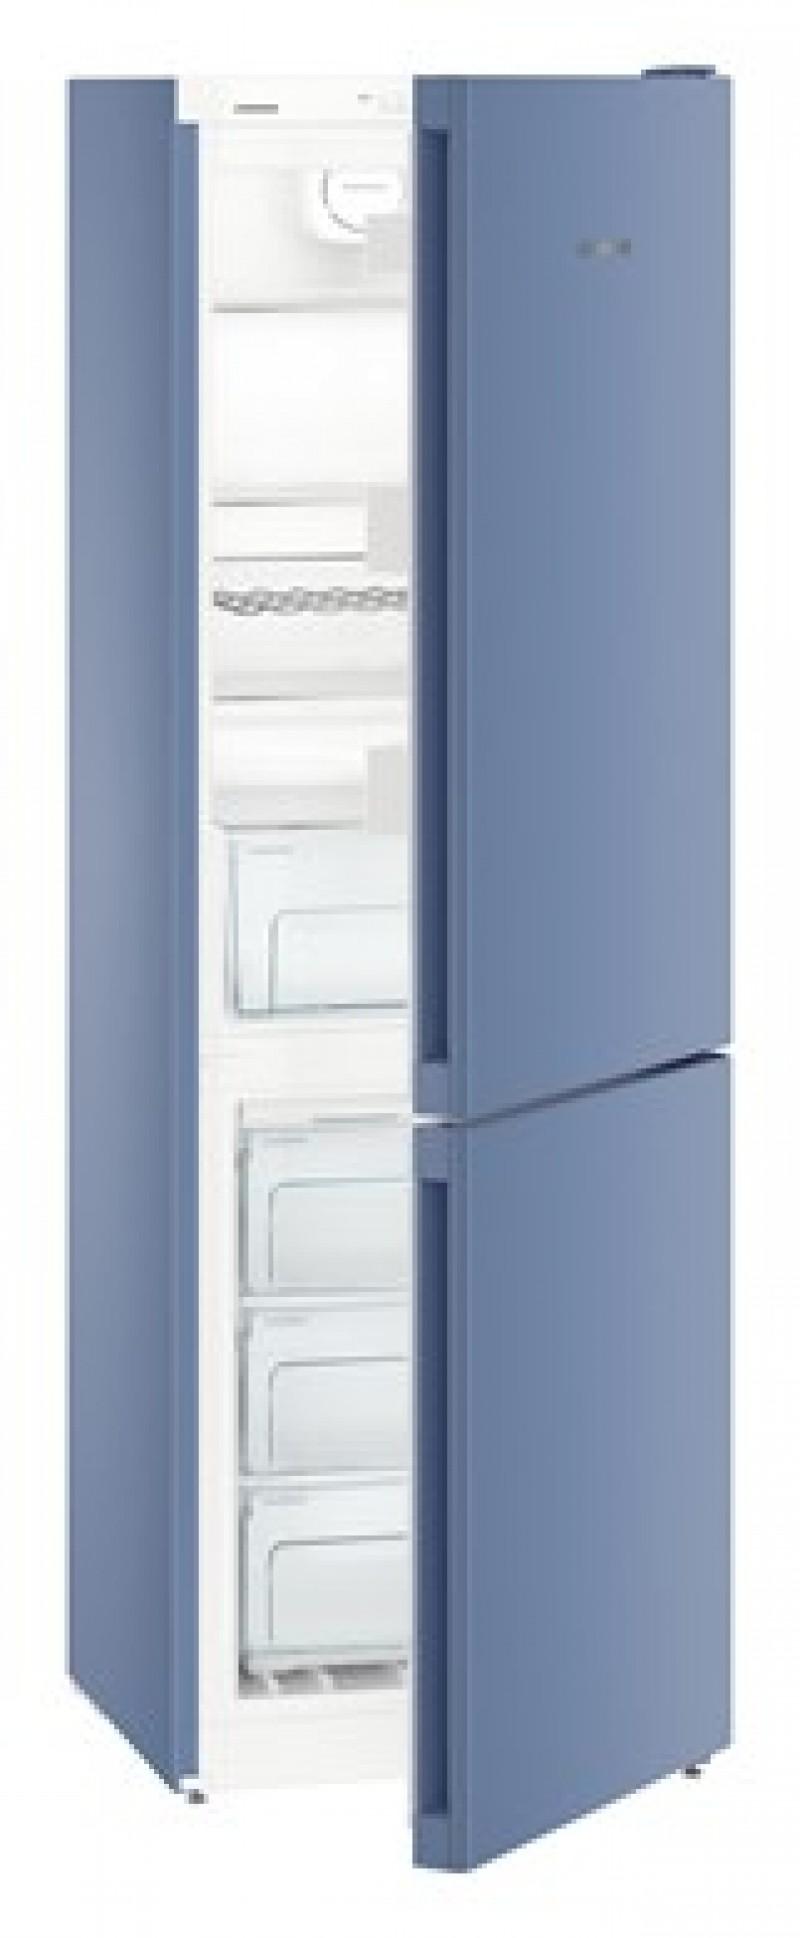 Liebherr Colours Comfort Range - Frozen Blue - Kiwi Green